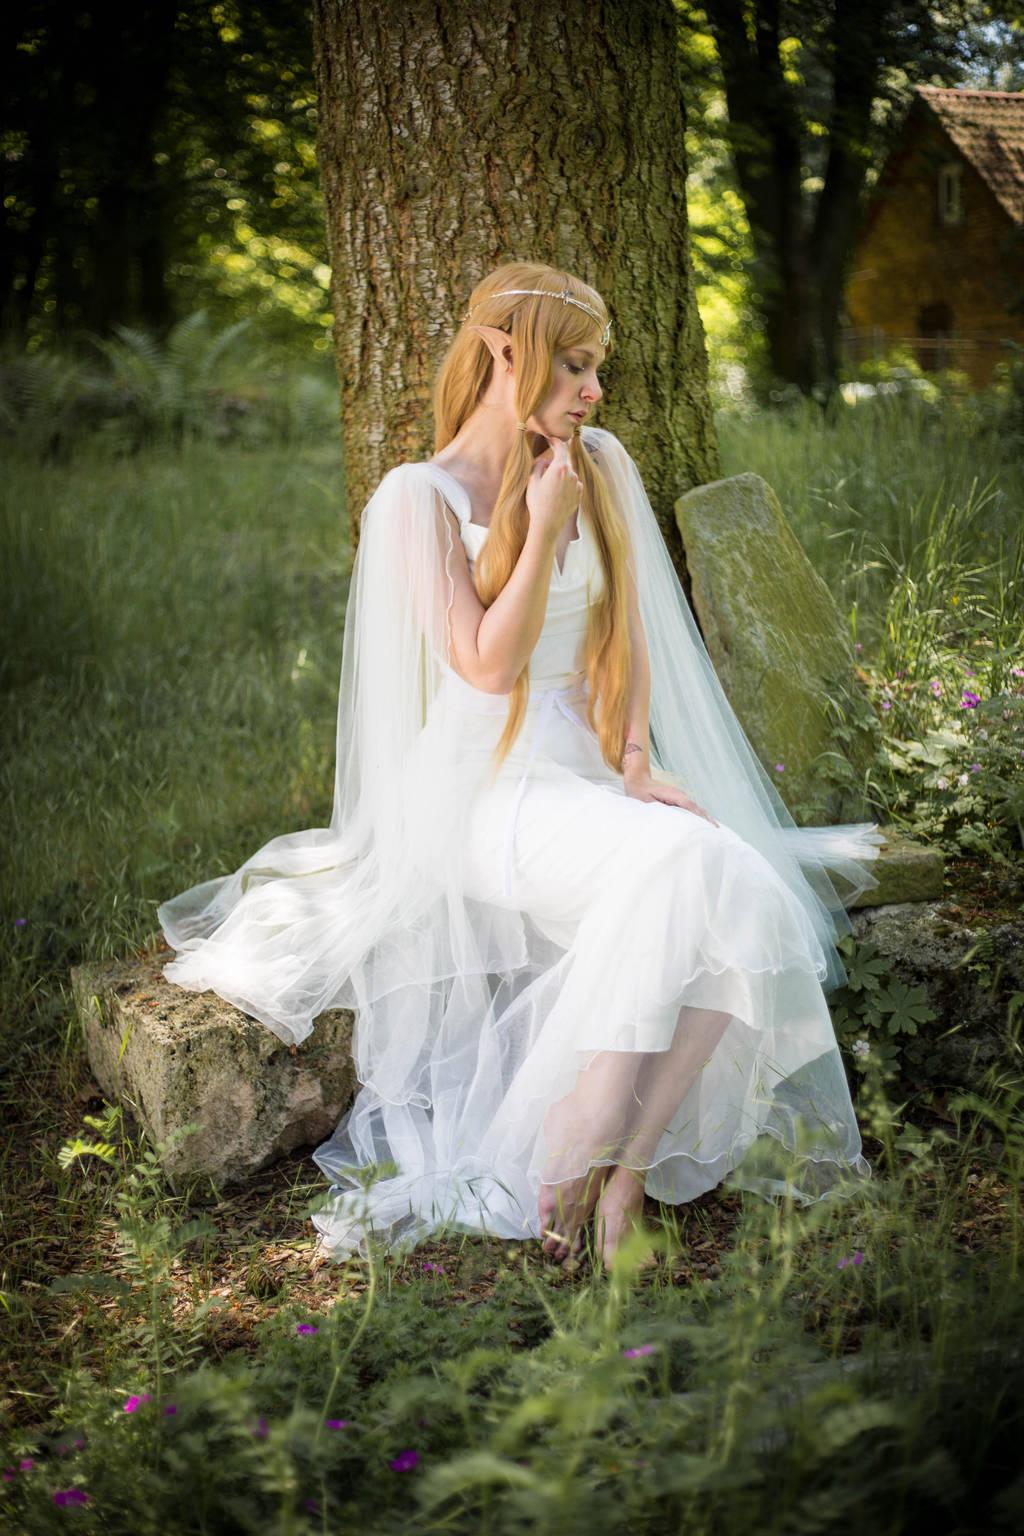 Elven Princess 02 by Fuchsfee-Stock